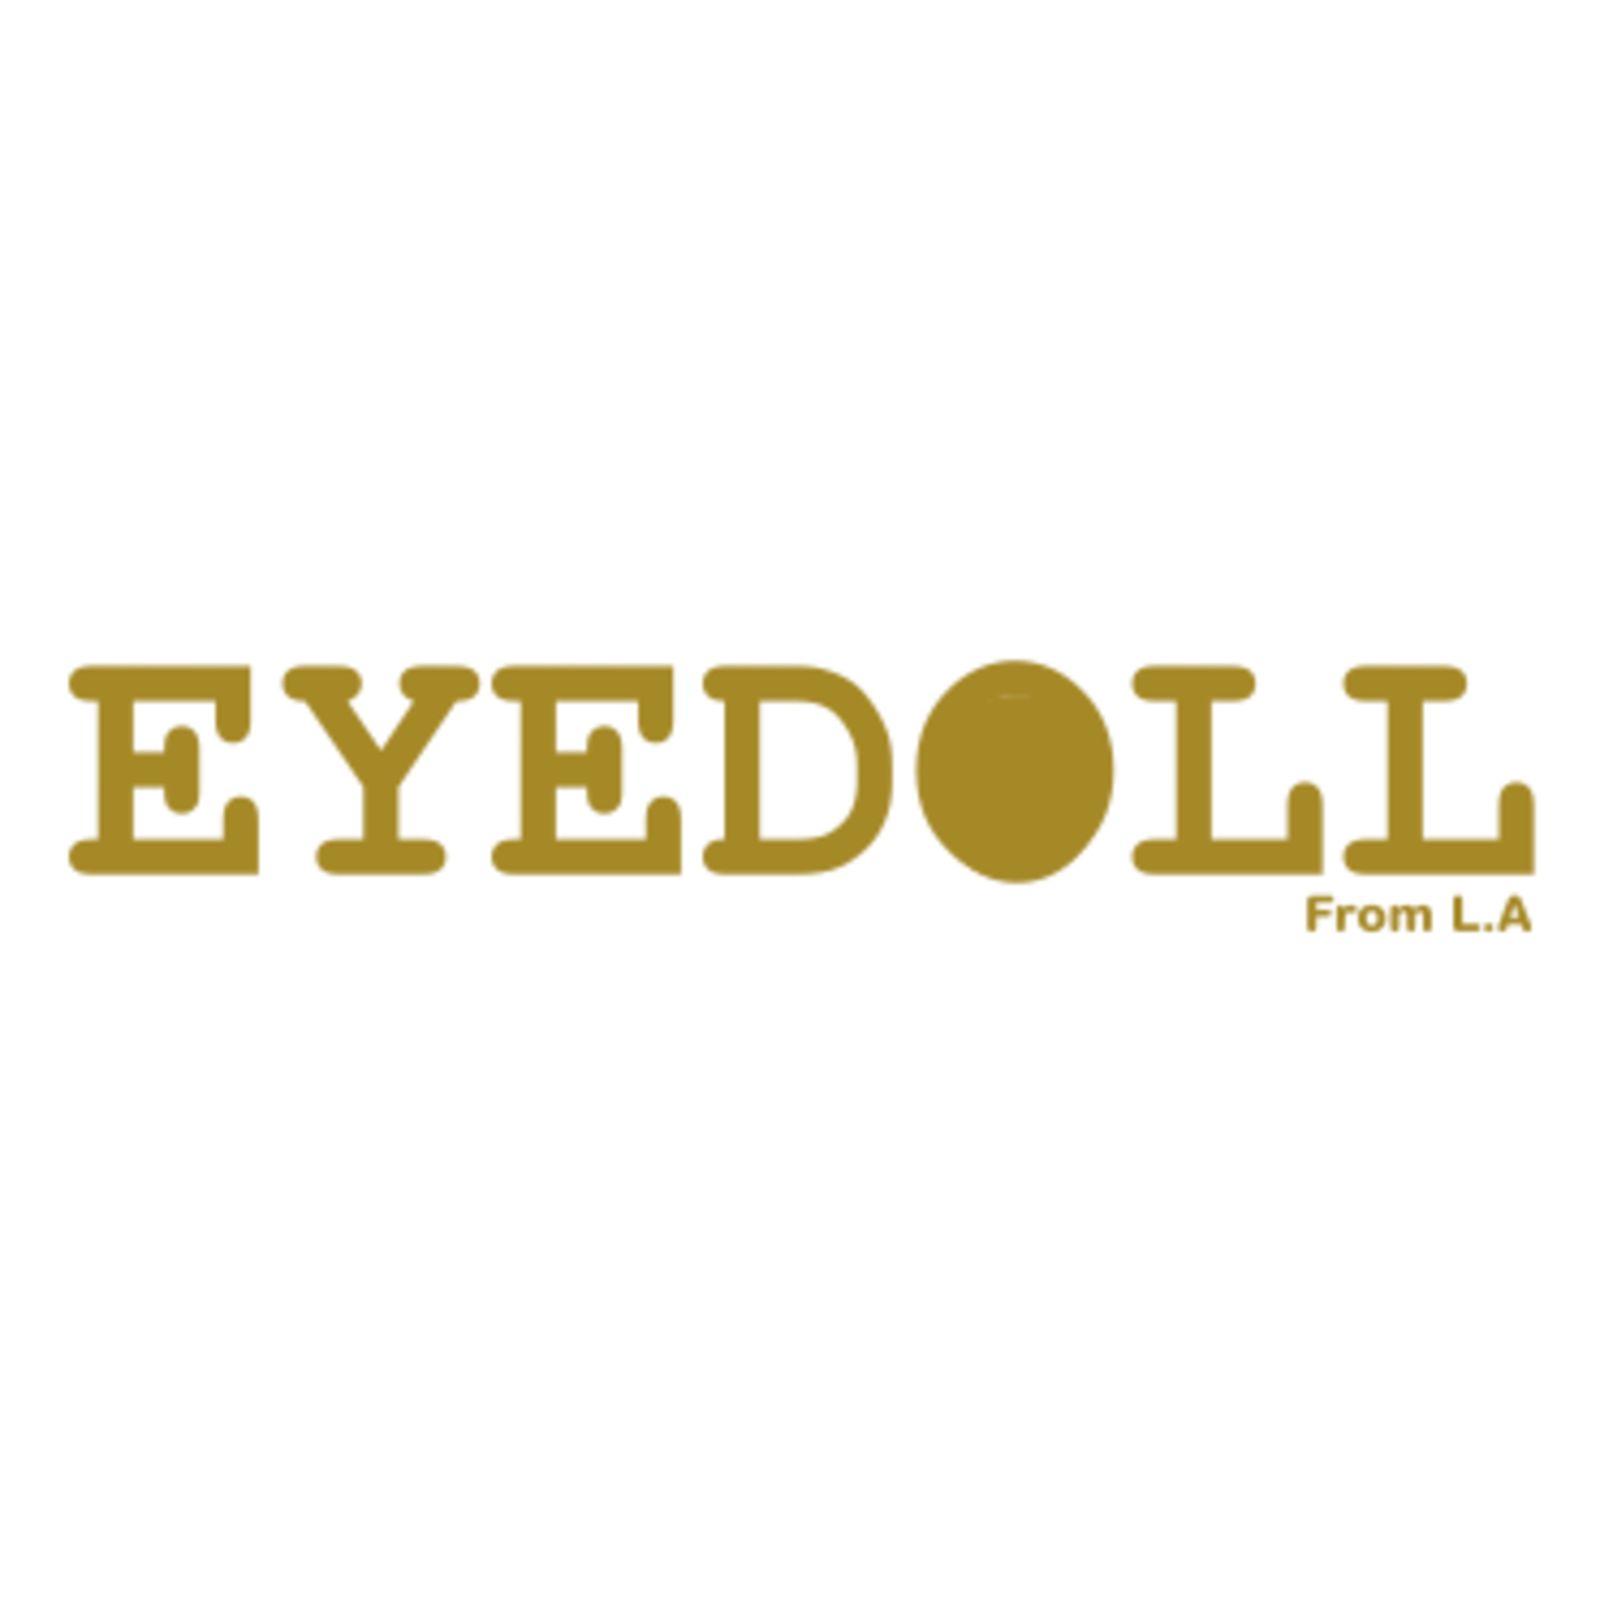 EYEDOLL (Bild 1)